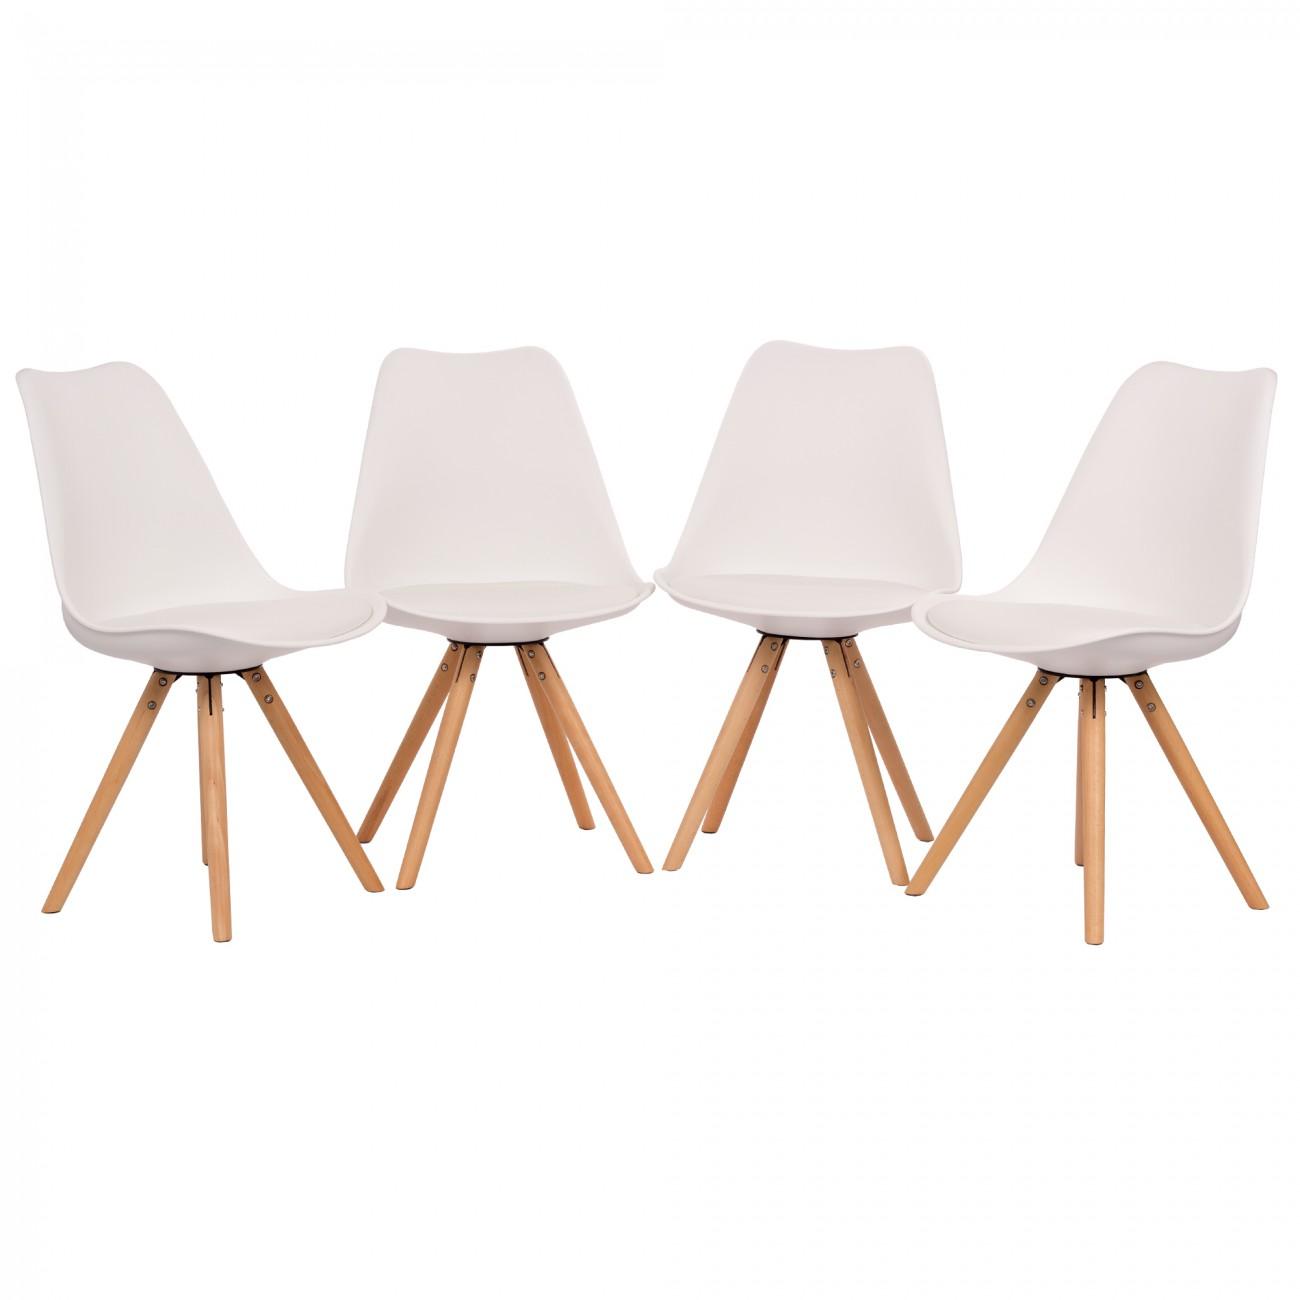 Makika Retro Stuhl Design Stuhl   MOOL 4er Set In Weiß U2013 Bild 2